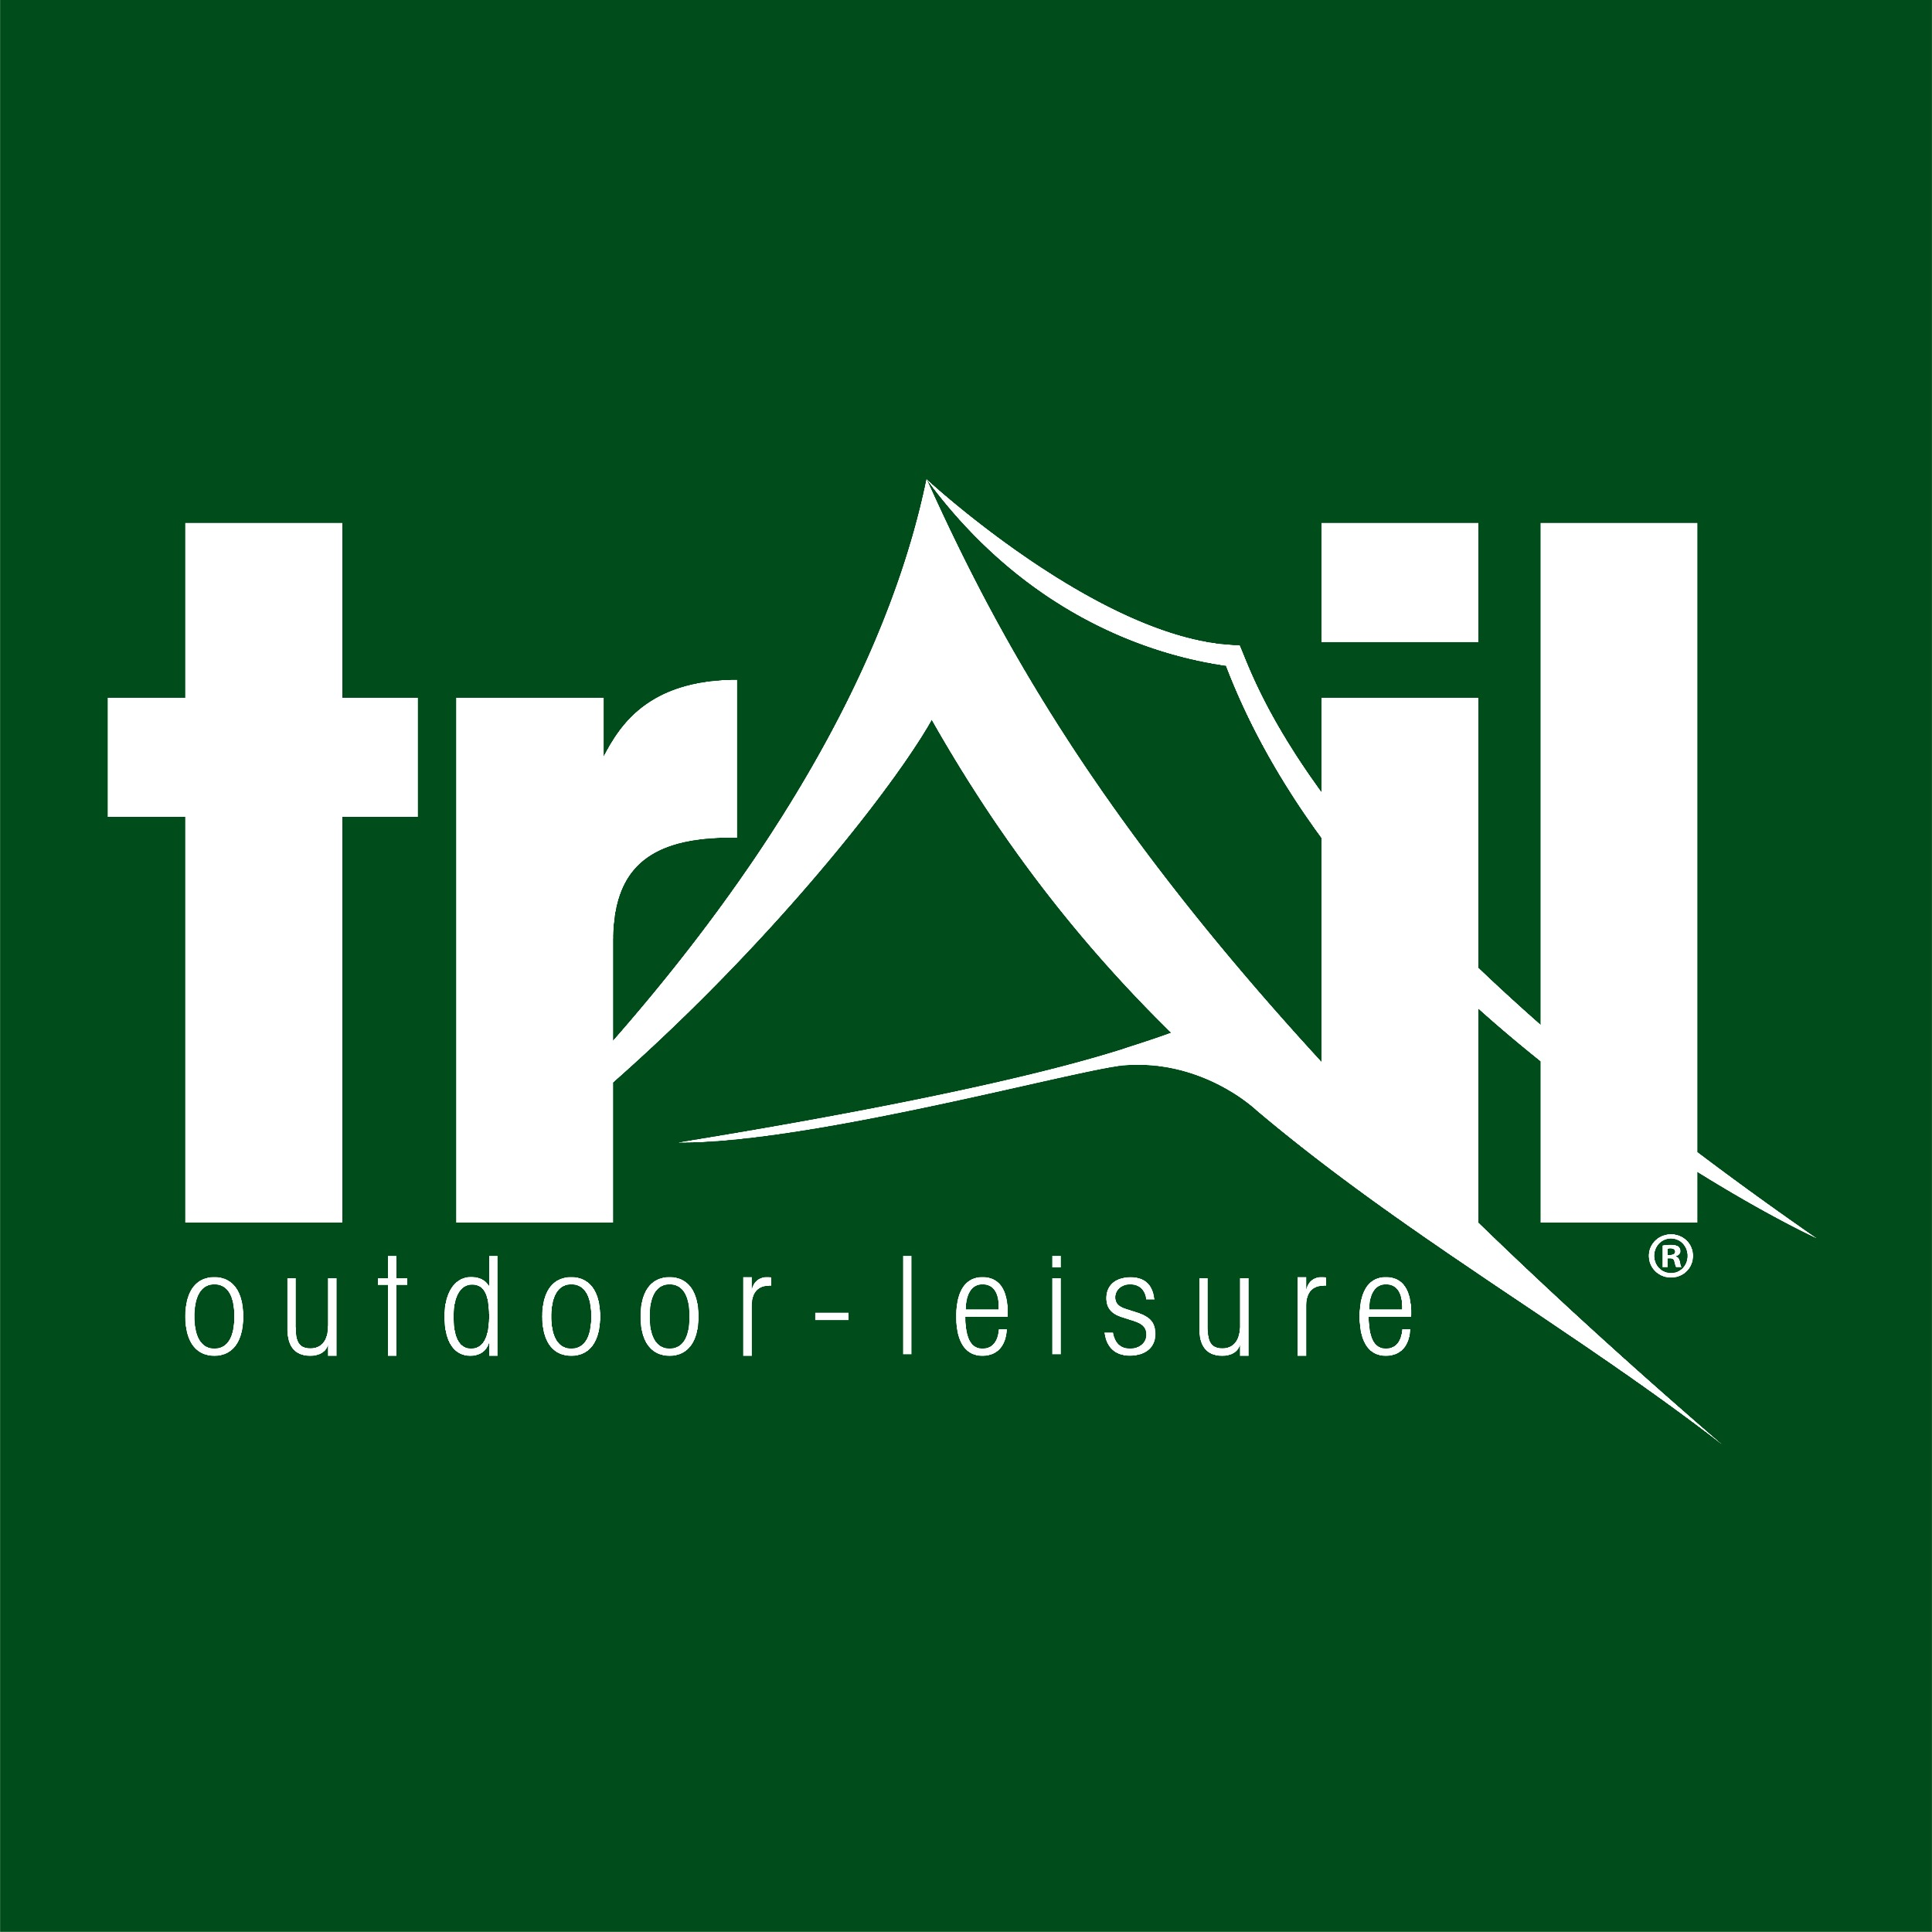 Trail_Square_Green_1